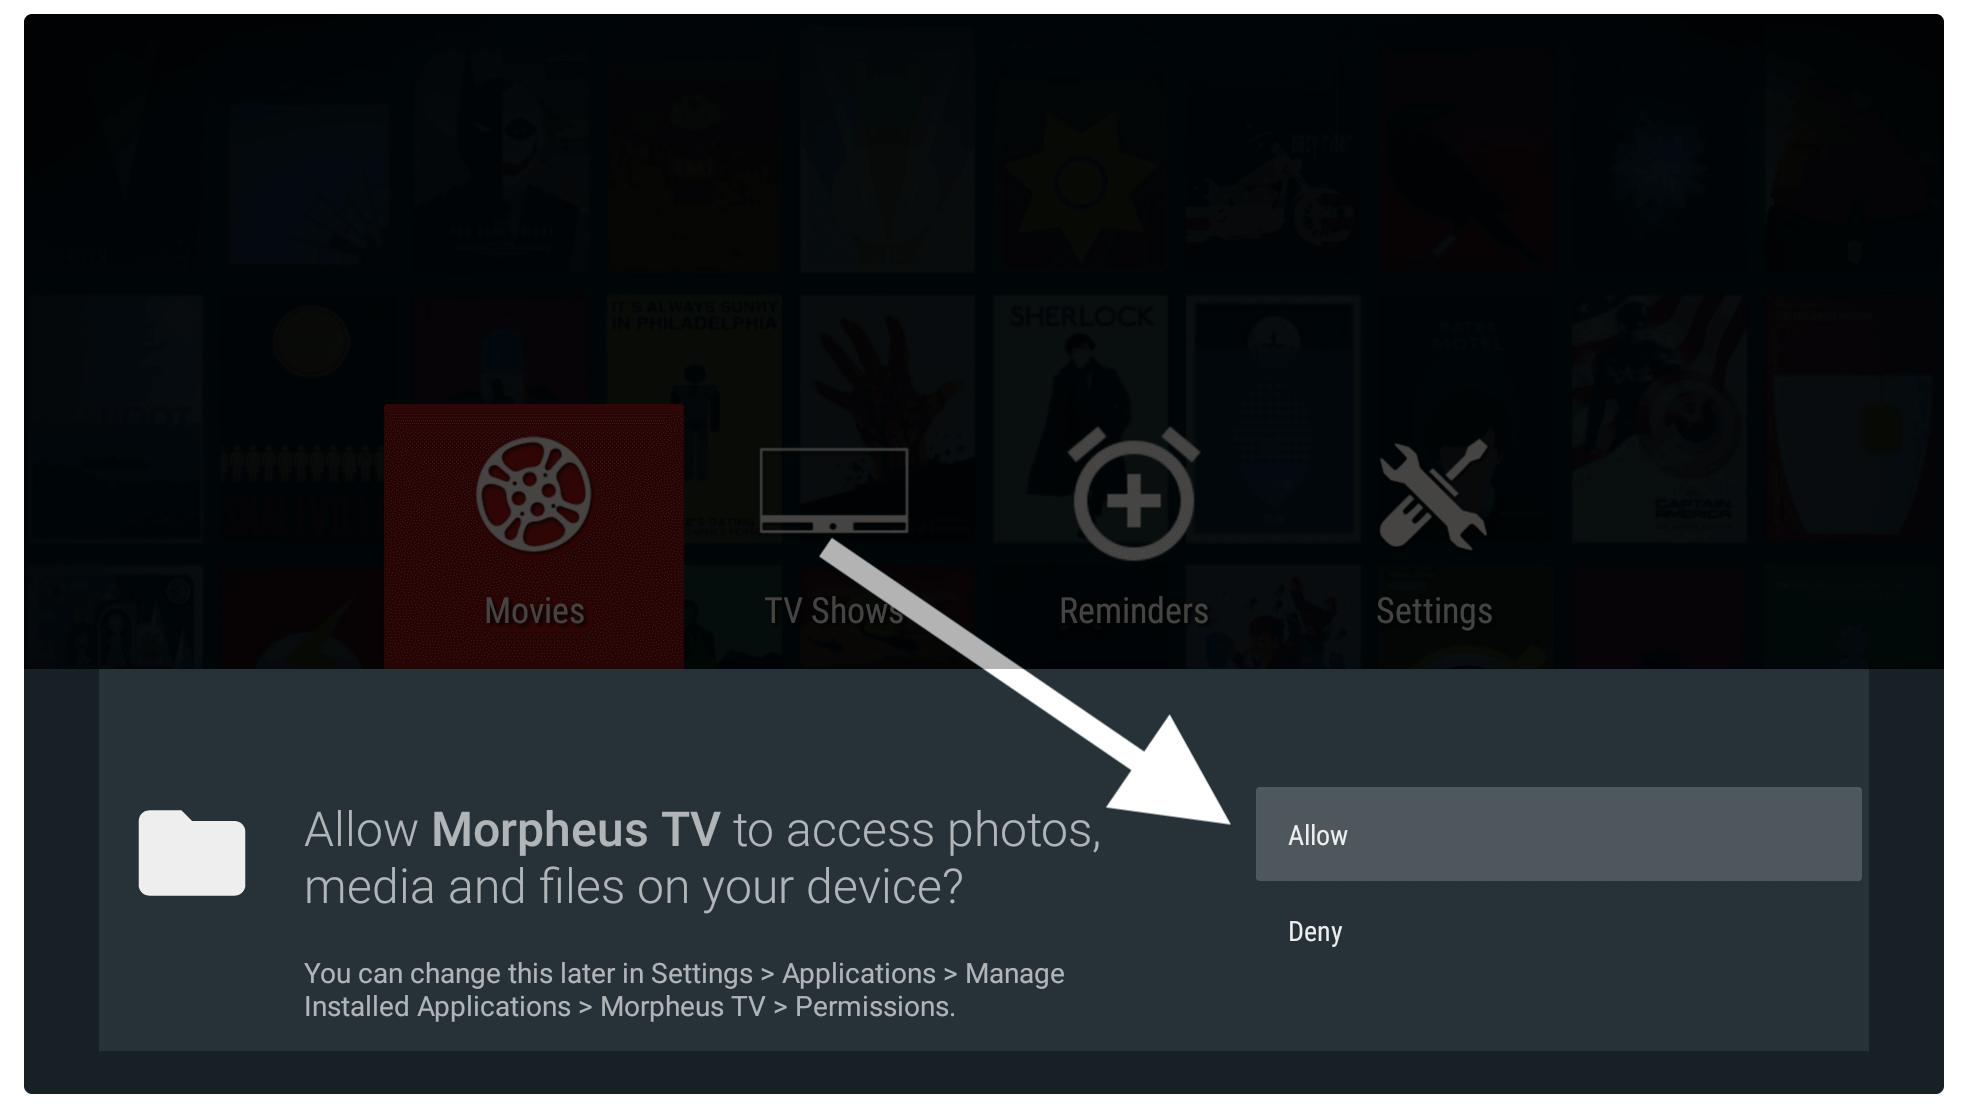 How-To-Use-Morpheus-App-in-Amazon-Firestick